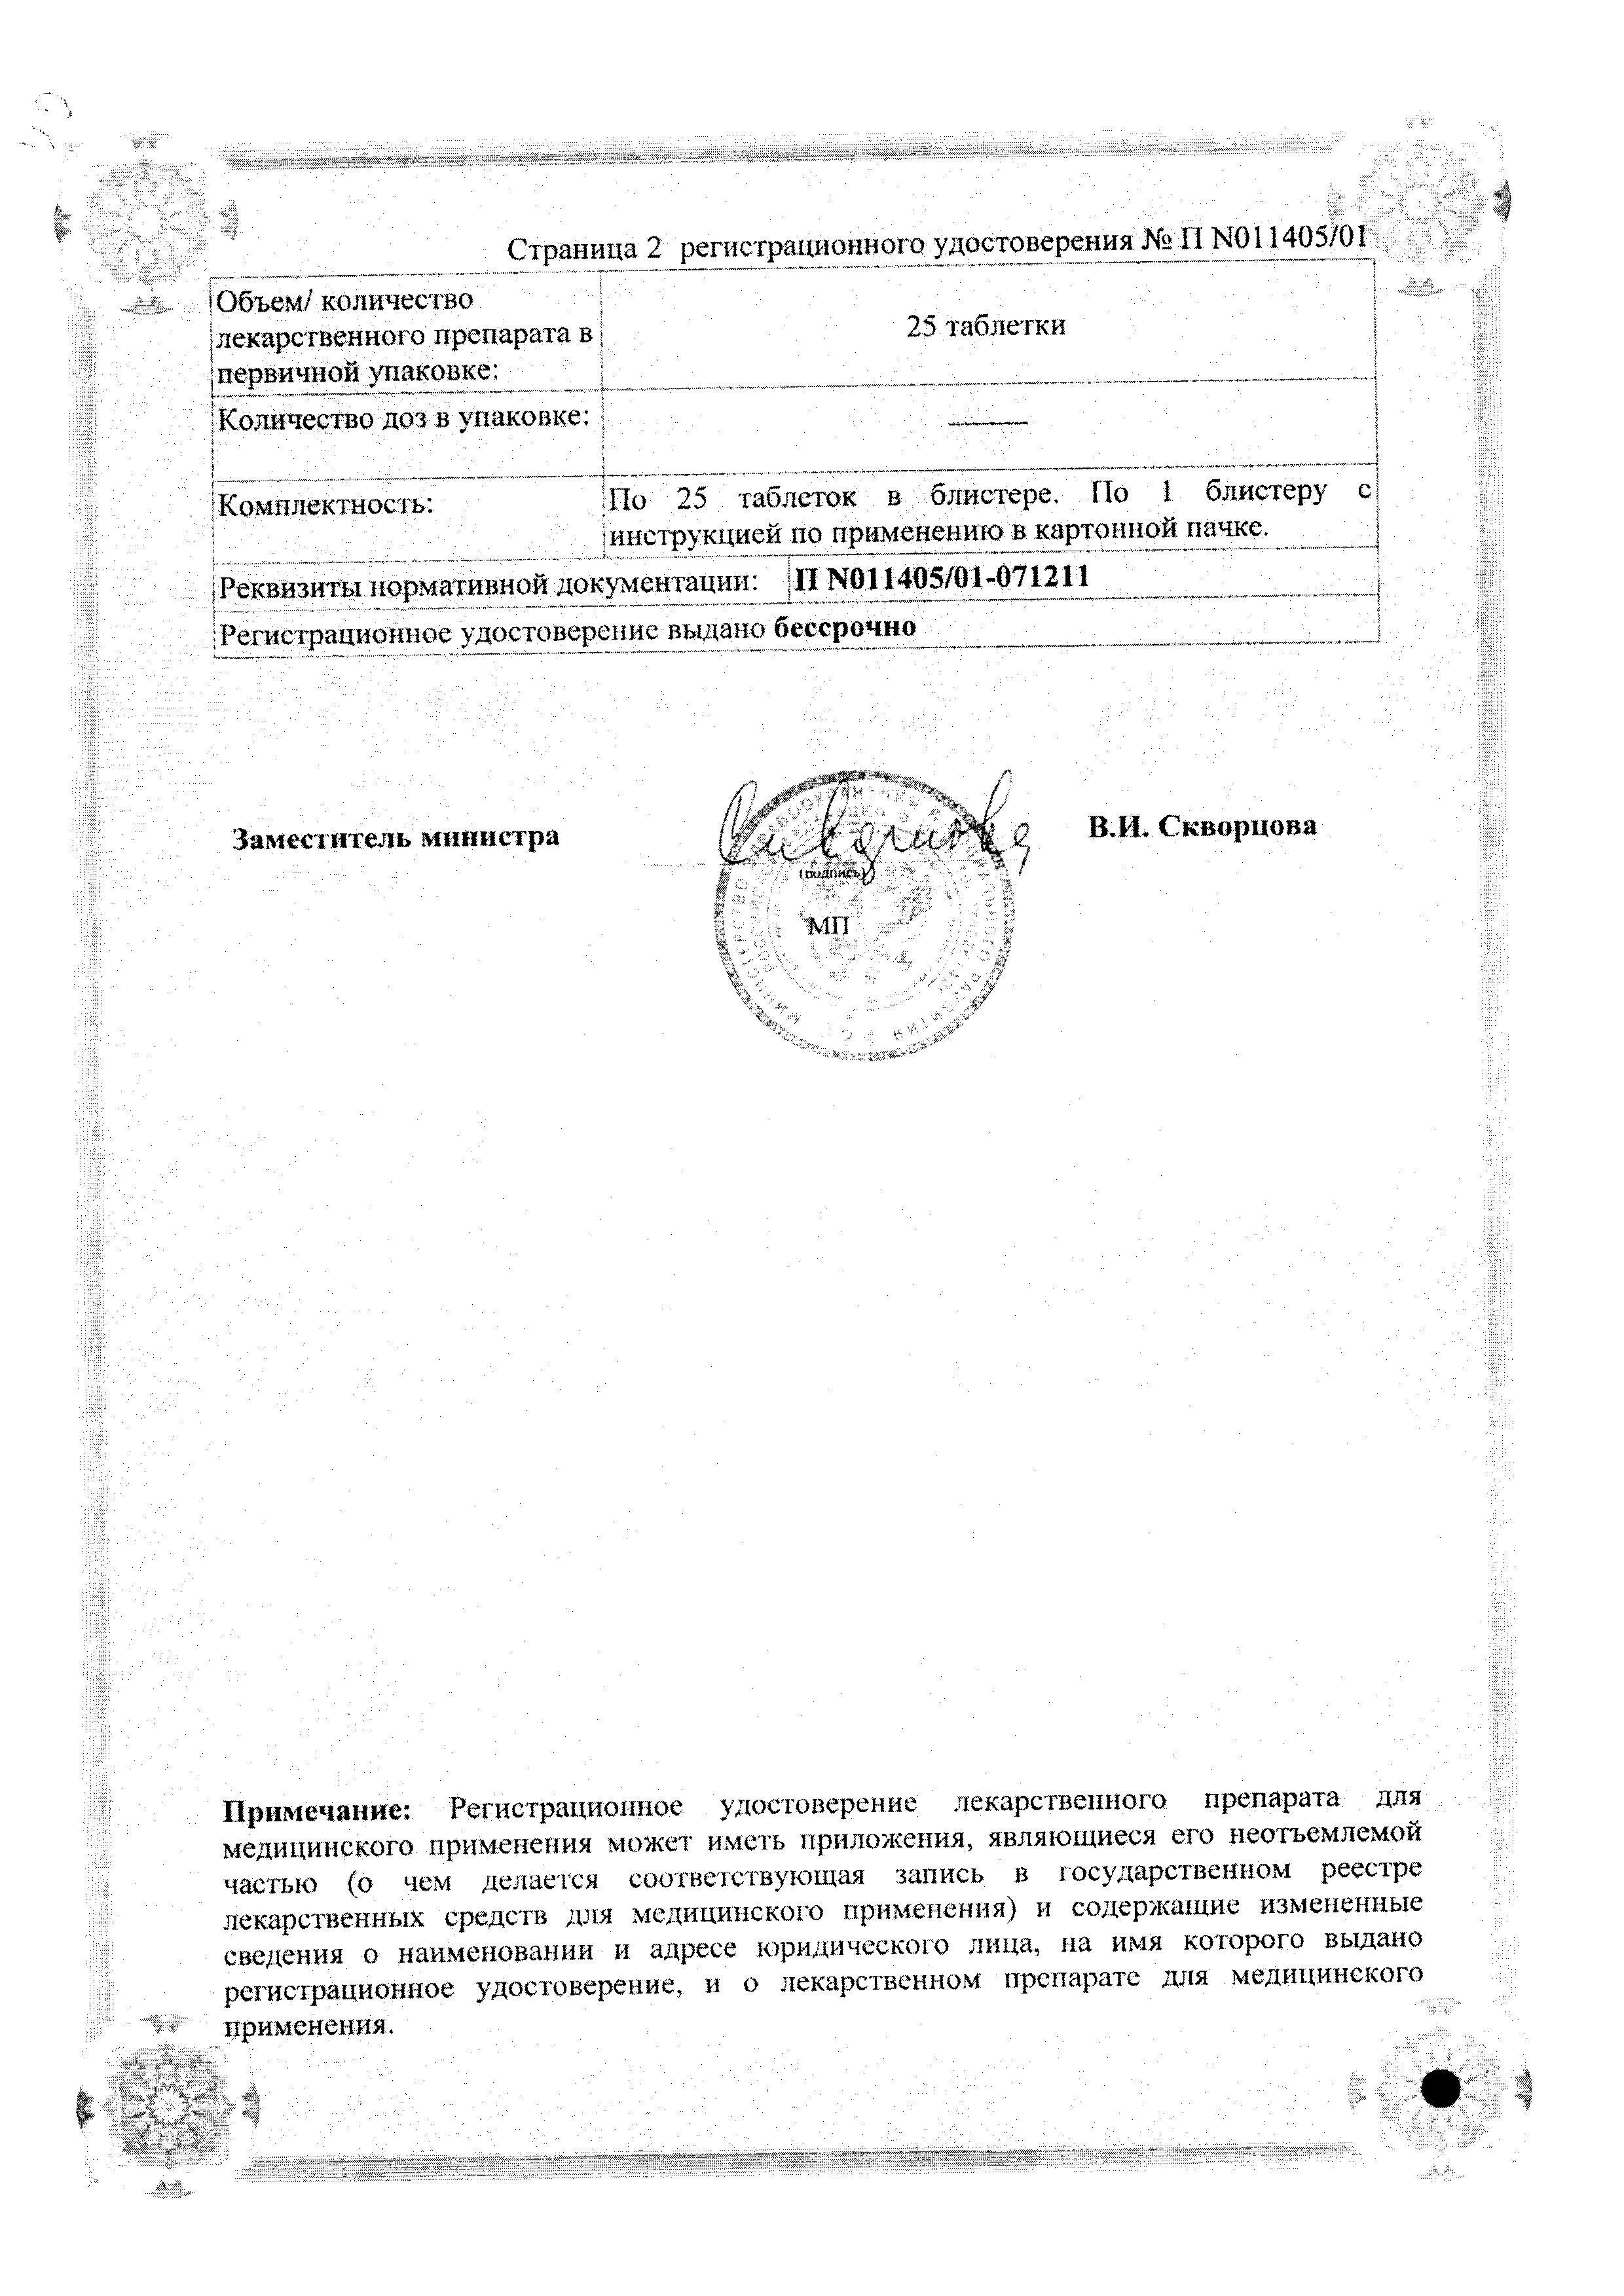 Атаракс сертификат